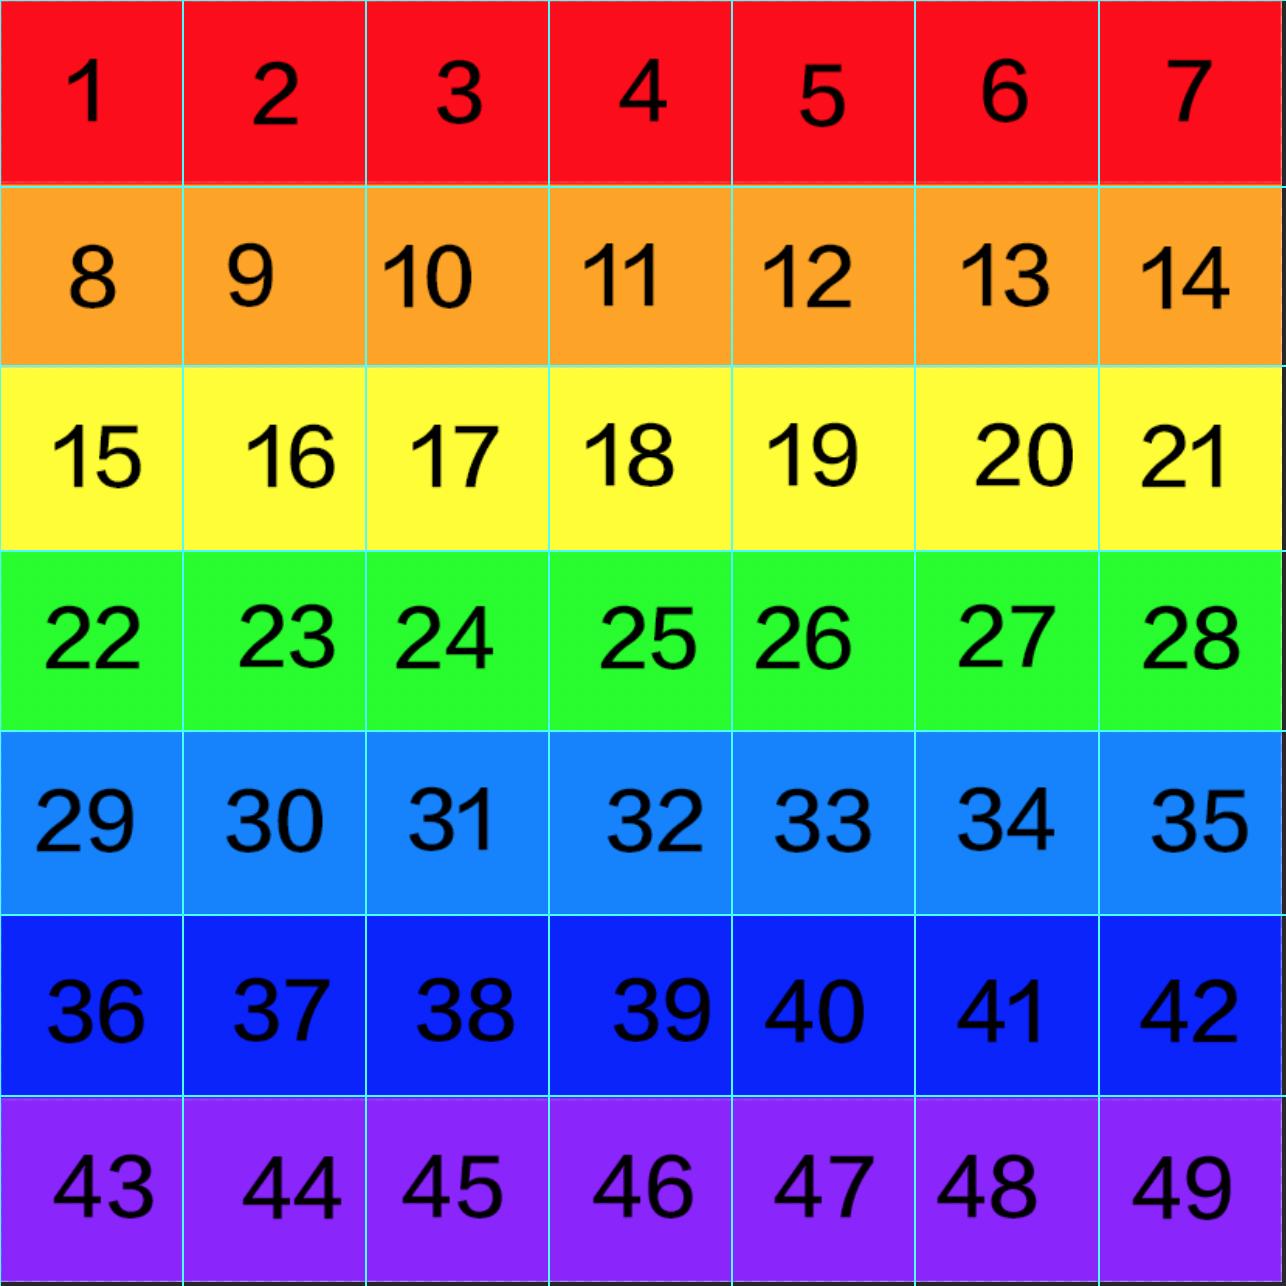 image-demo-rainbow-pixel-index